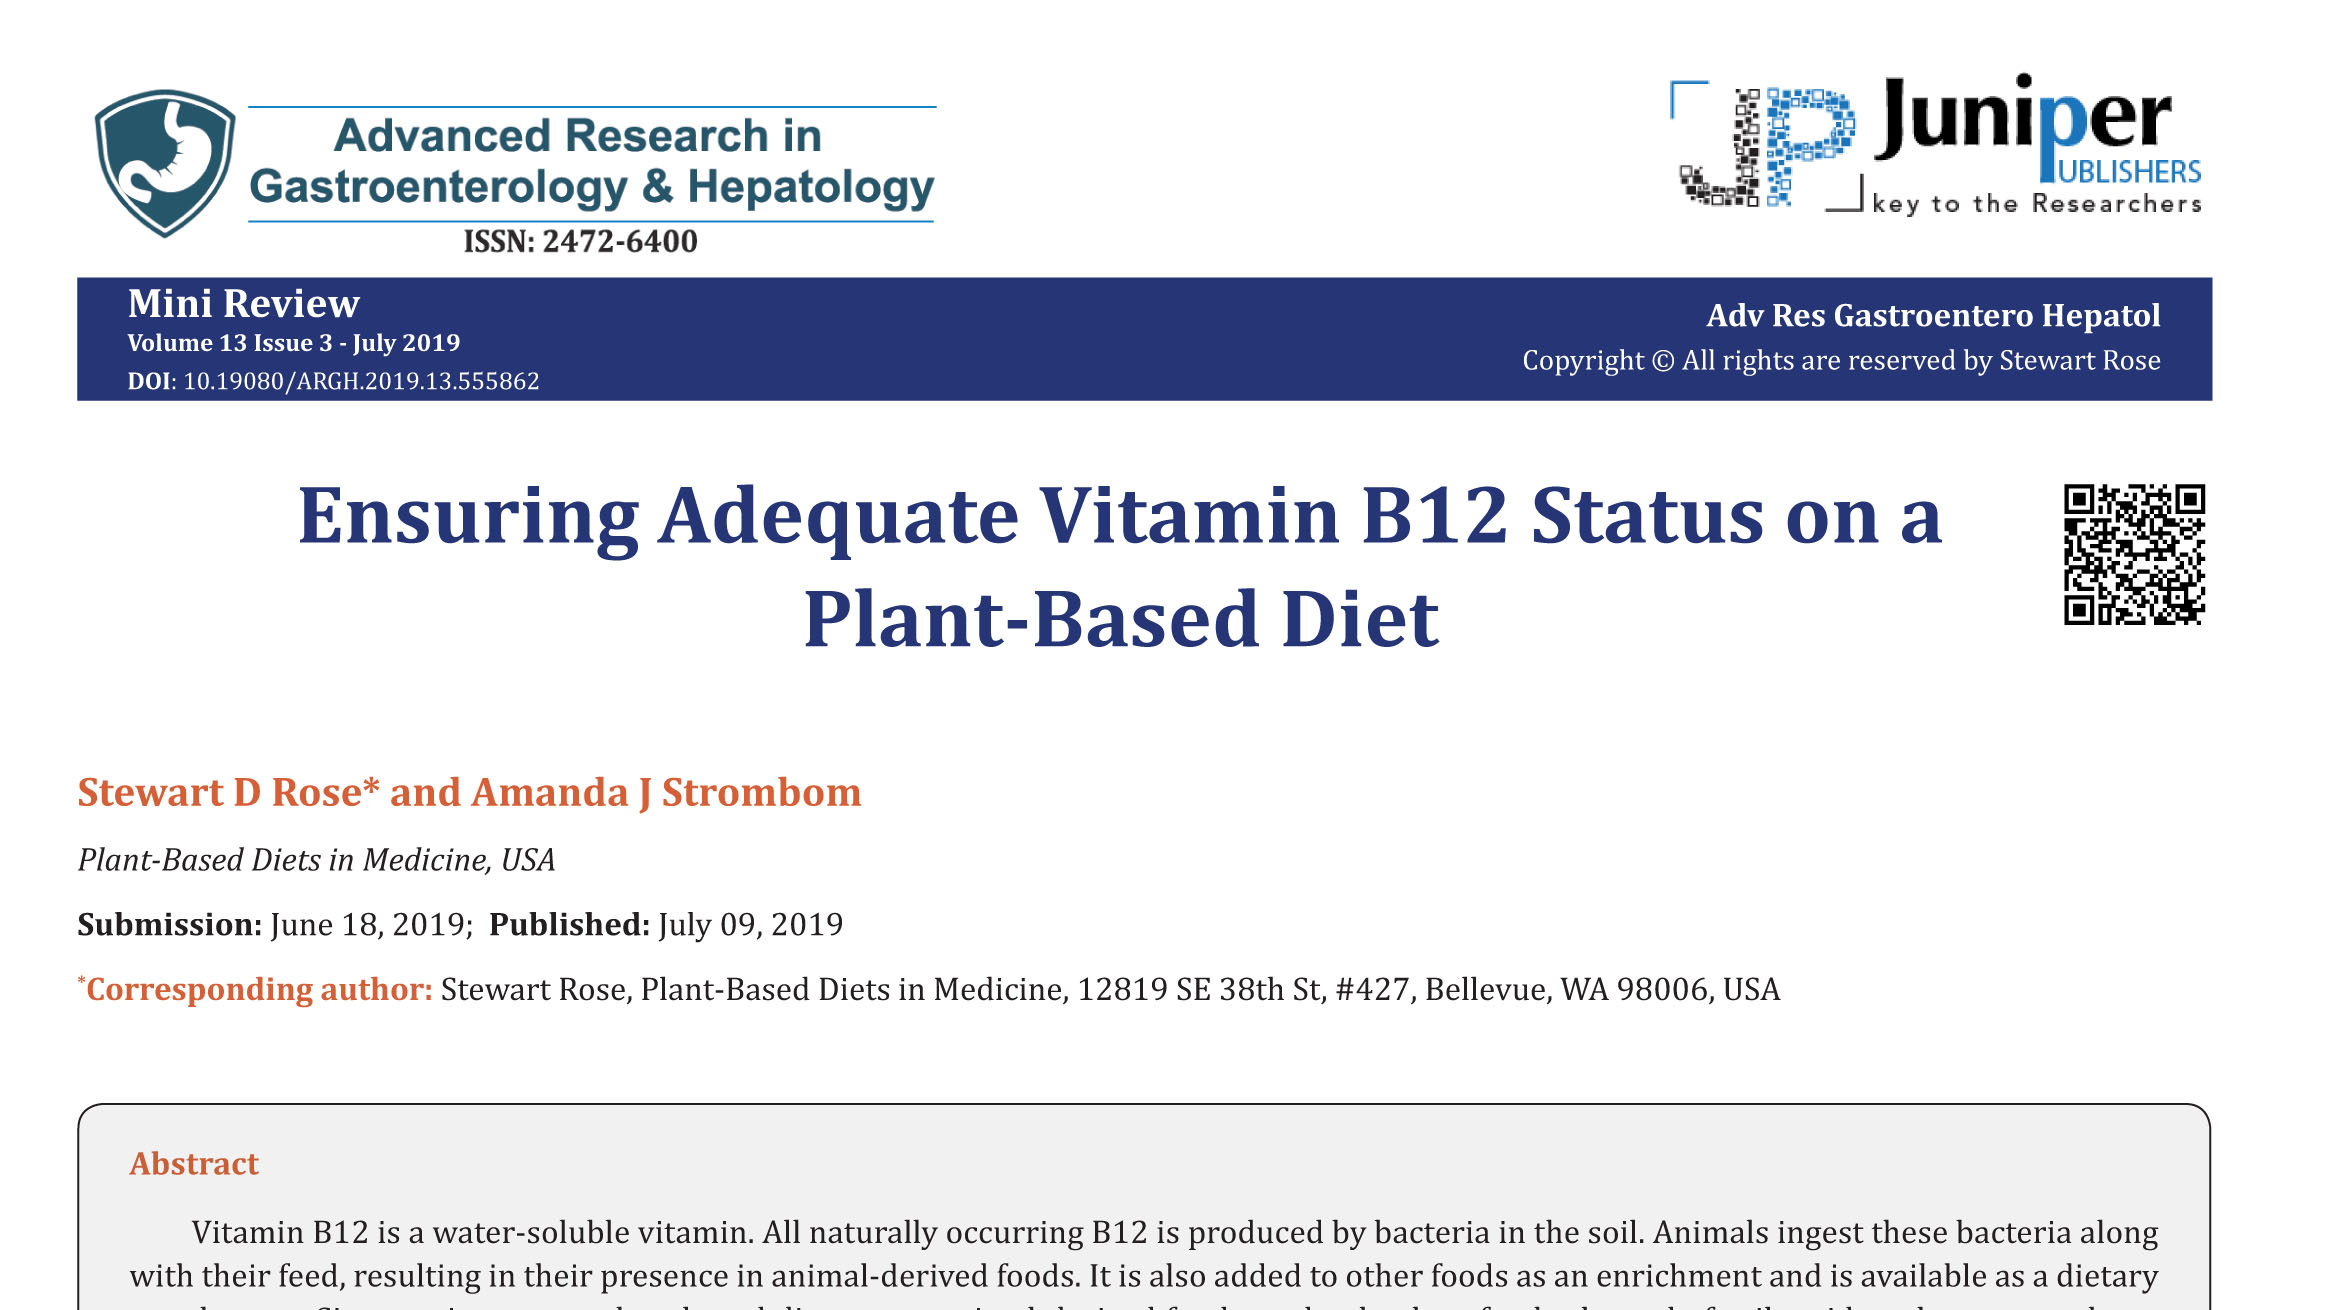 Ensuring Adequate Vitamin B12 Status on a Plant-Based Diet